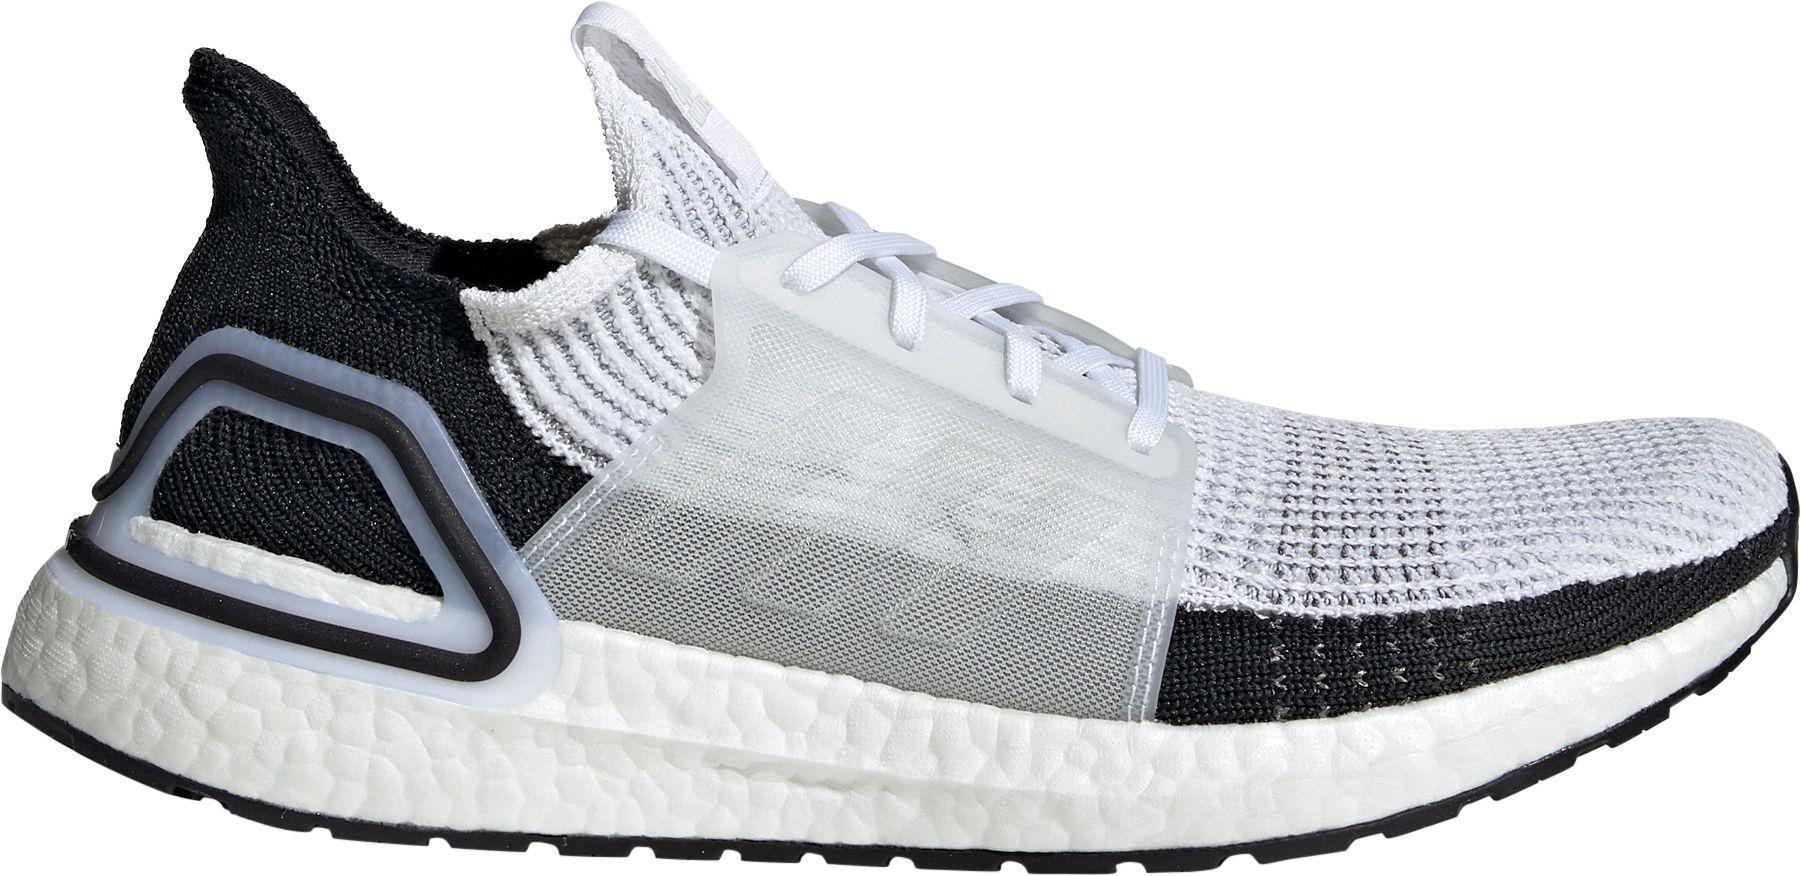 ec95cdb7c795c Lyst - adidas Ultraboost 19 Running Shoes in Gray for Men